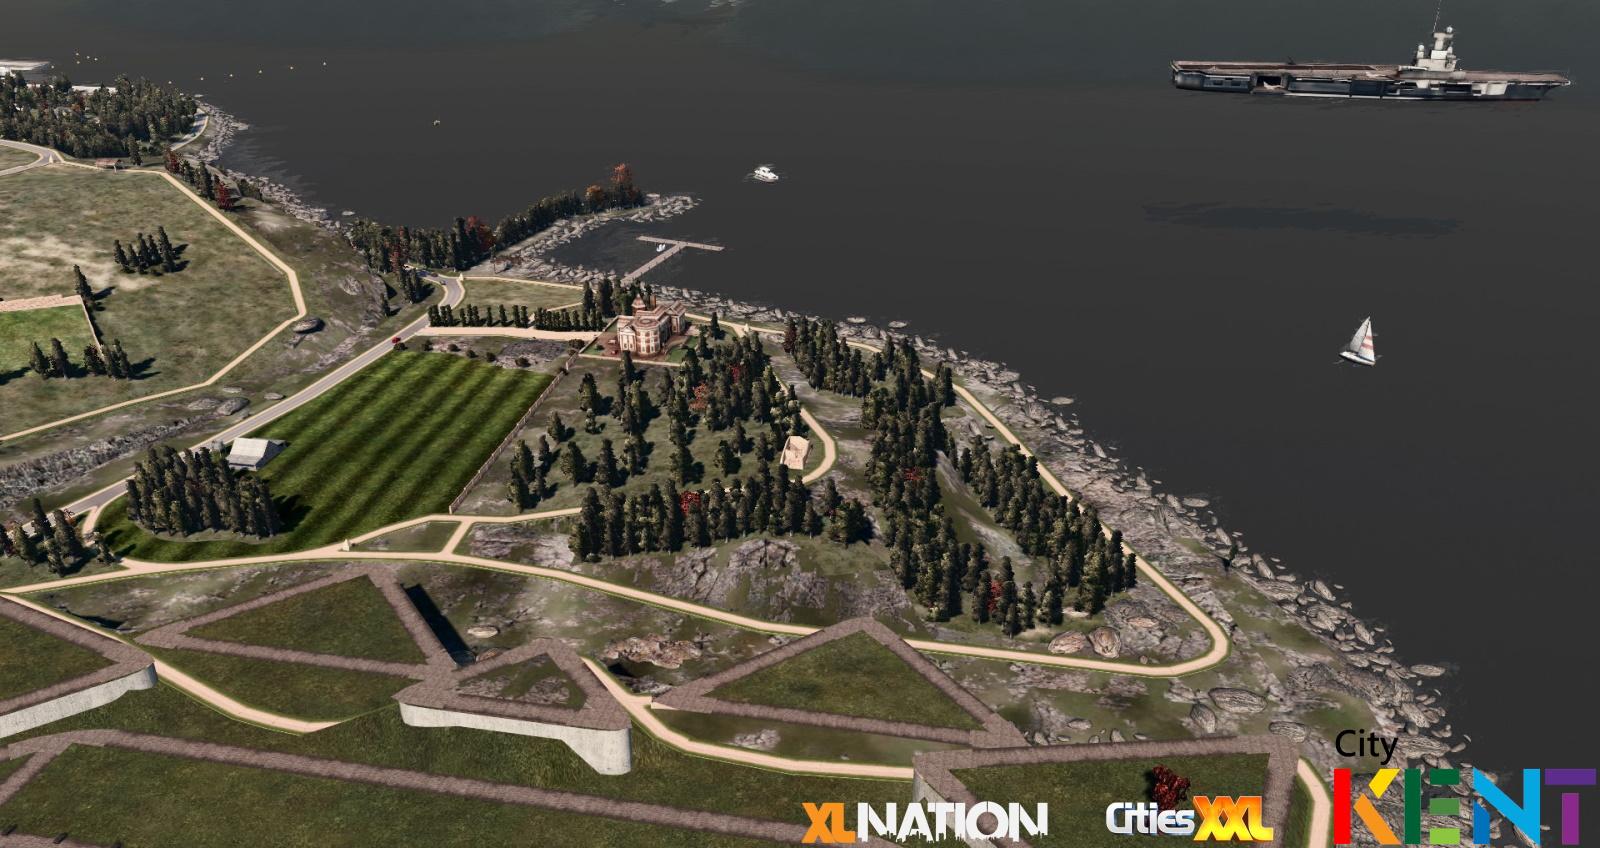 [Cities XXL] Kent - Page 2 Abraham-island_kent07_xln_citiesxxl-jpg